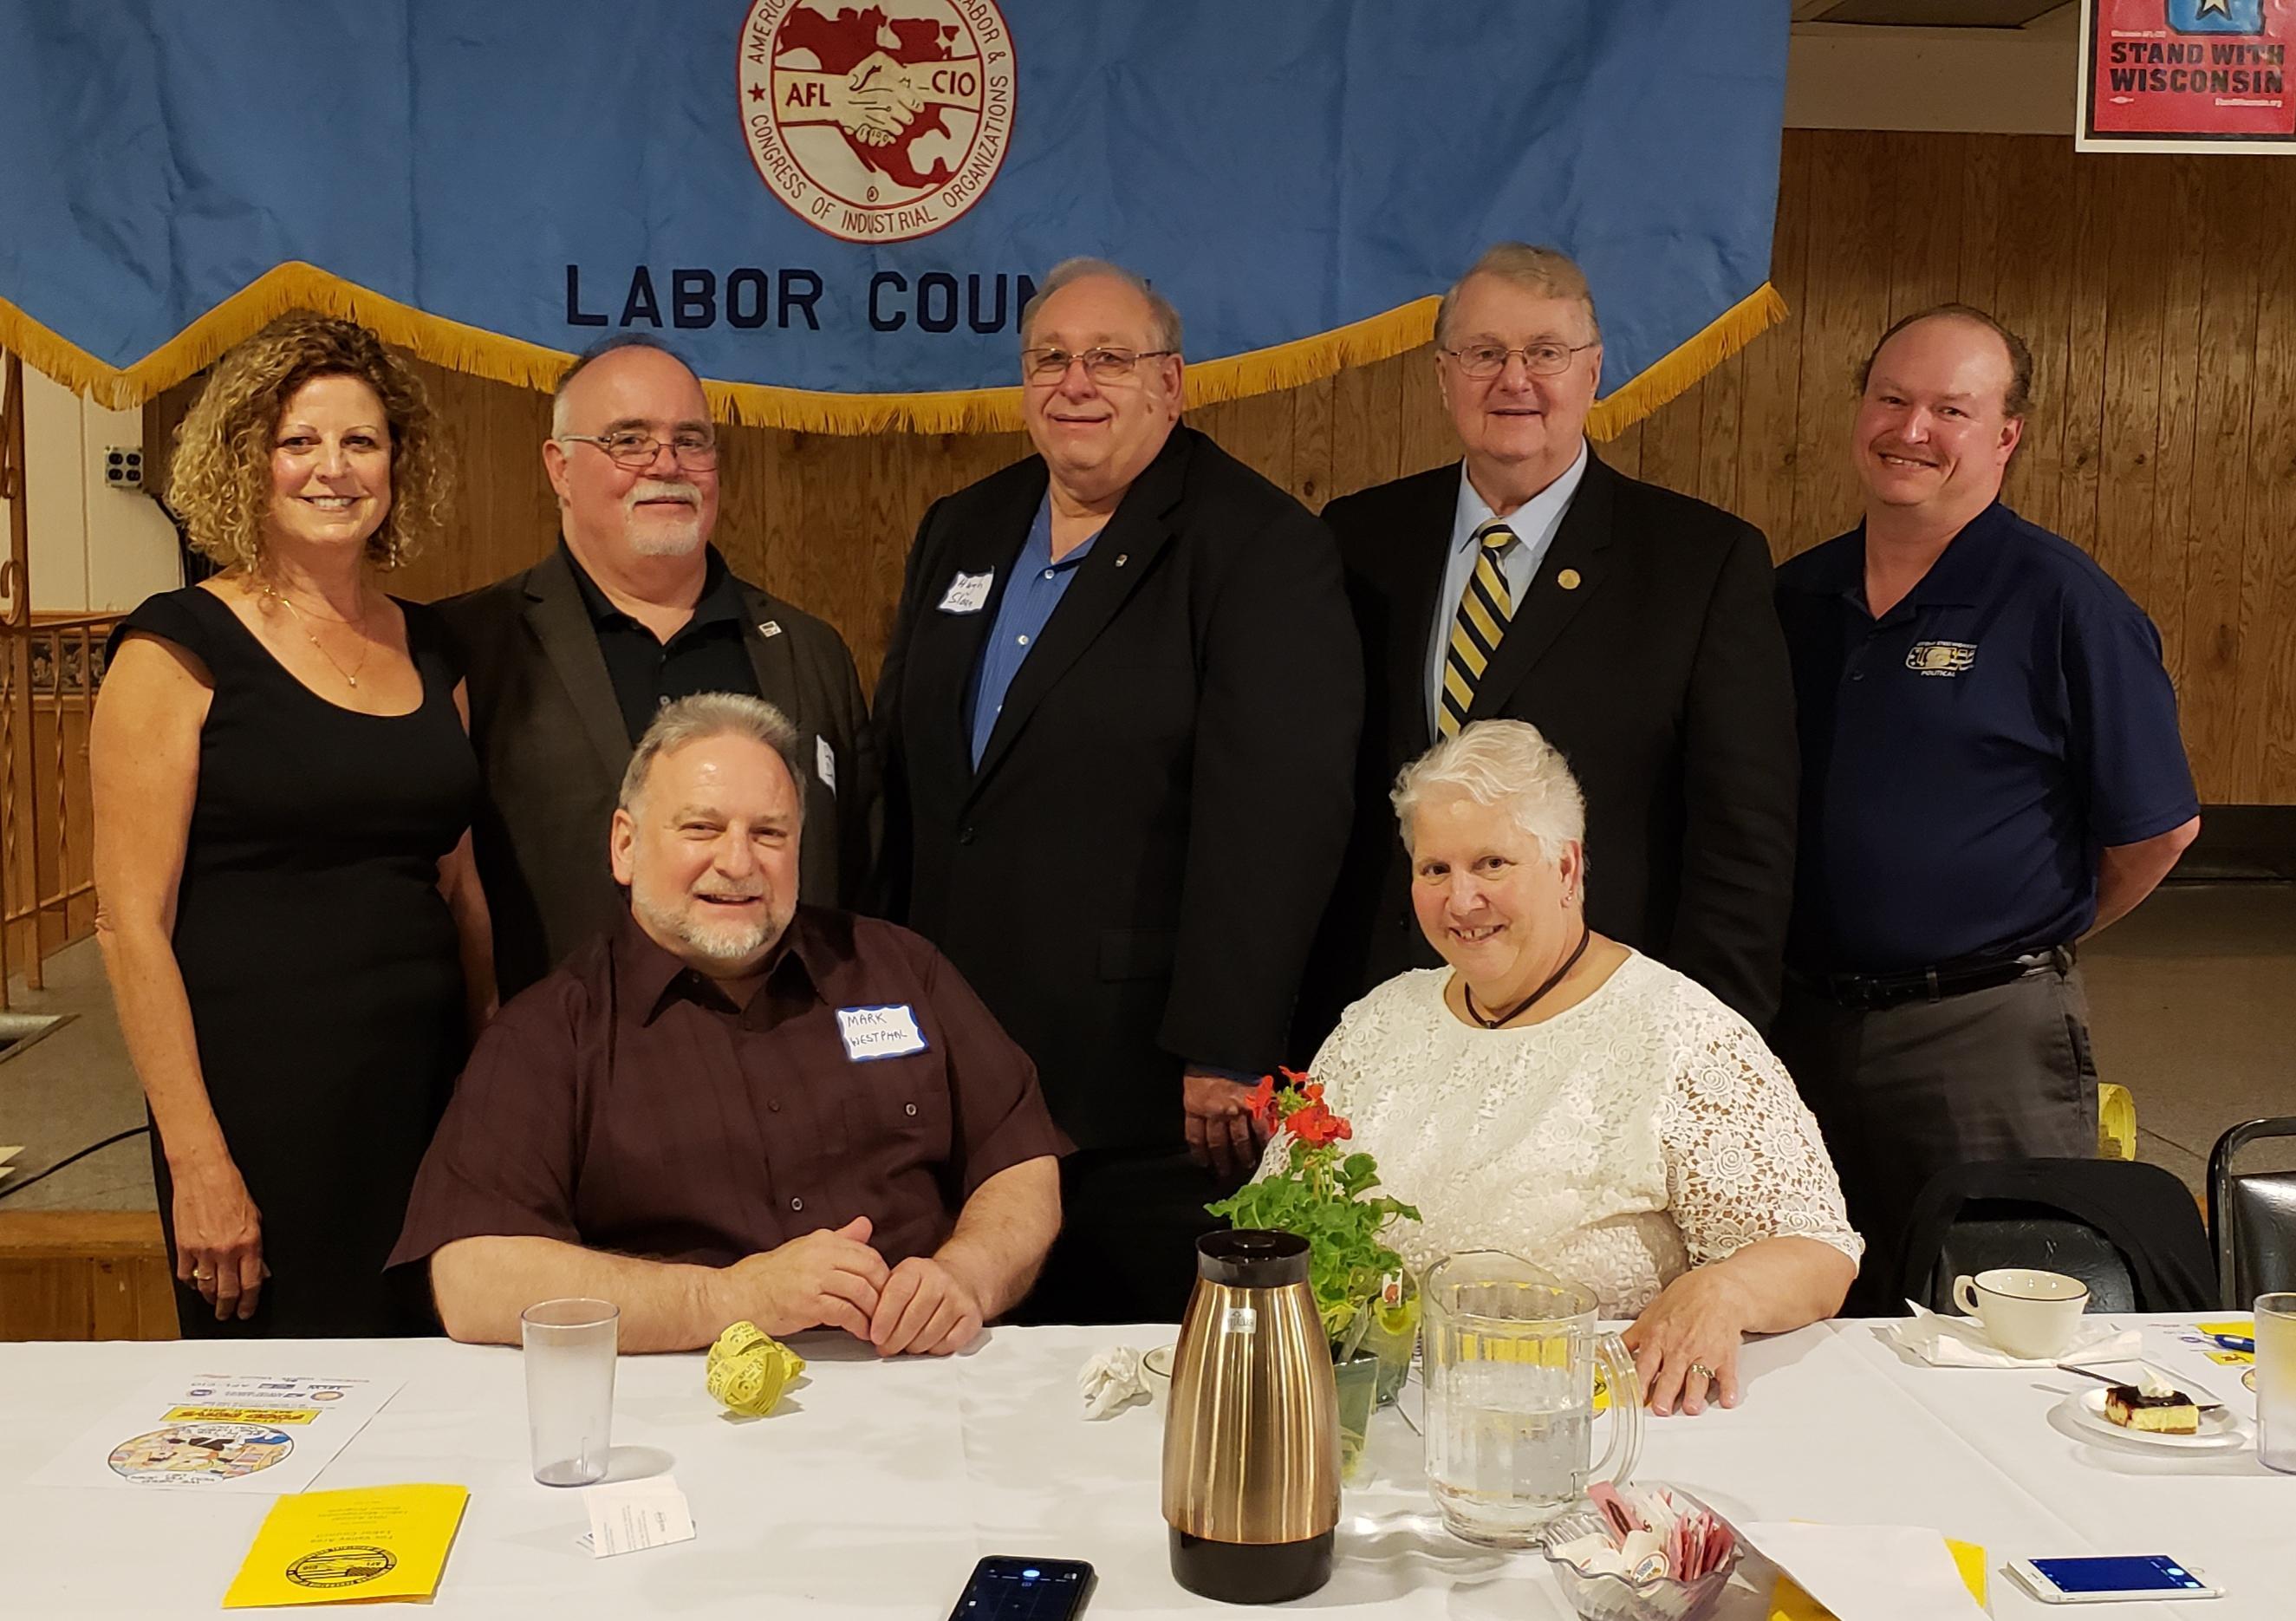 Fox Valley Area Labor Council, 70th Annual Labor Managemennt Dinner 2019